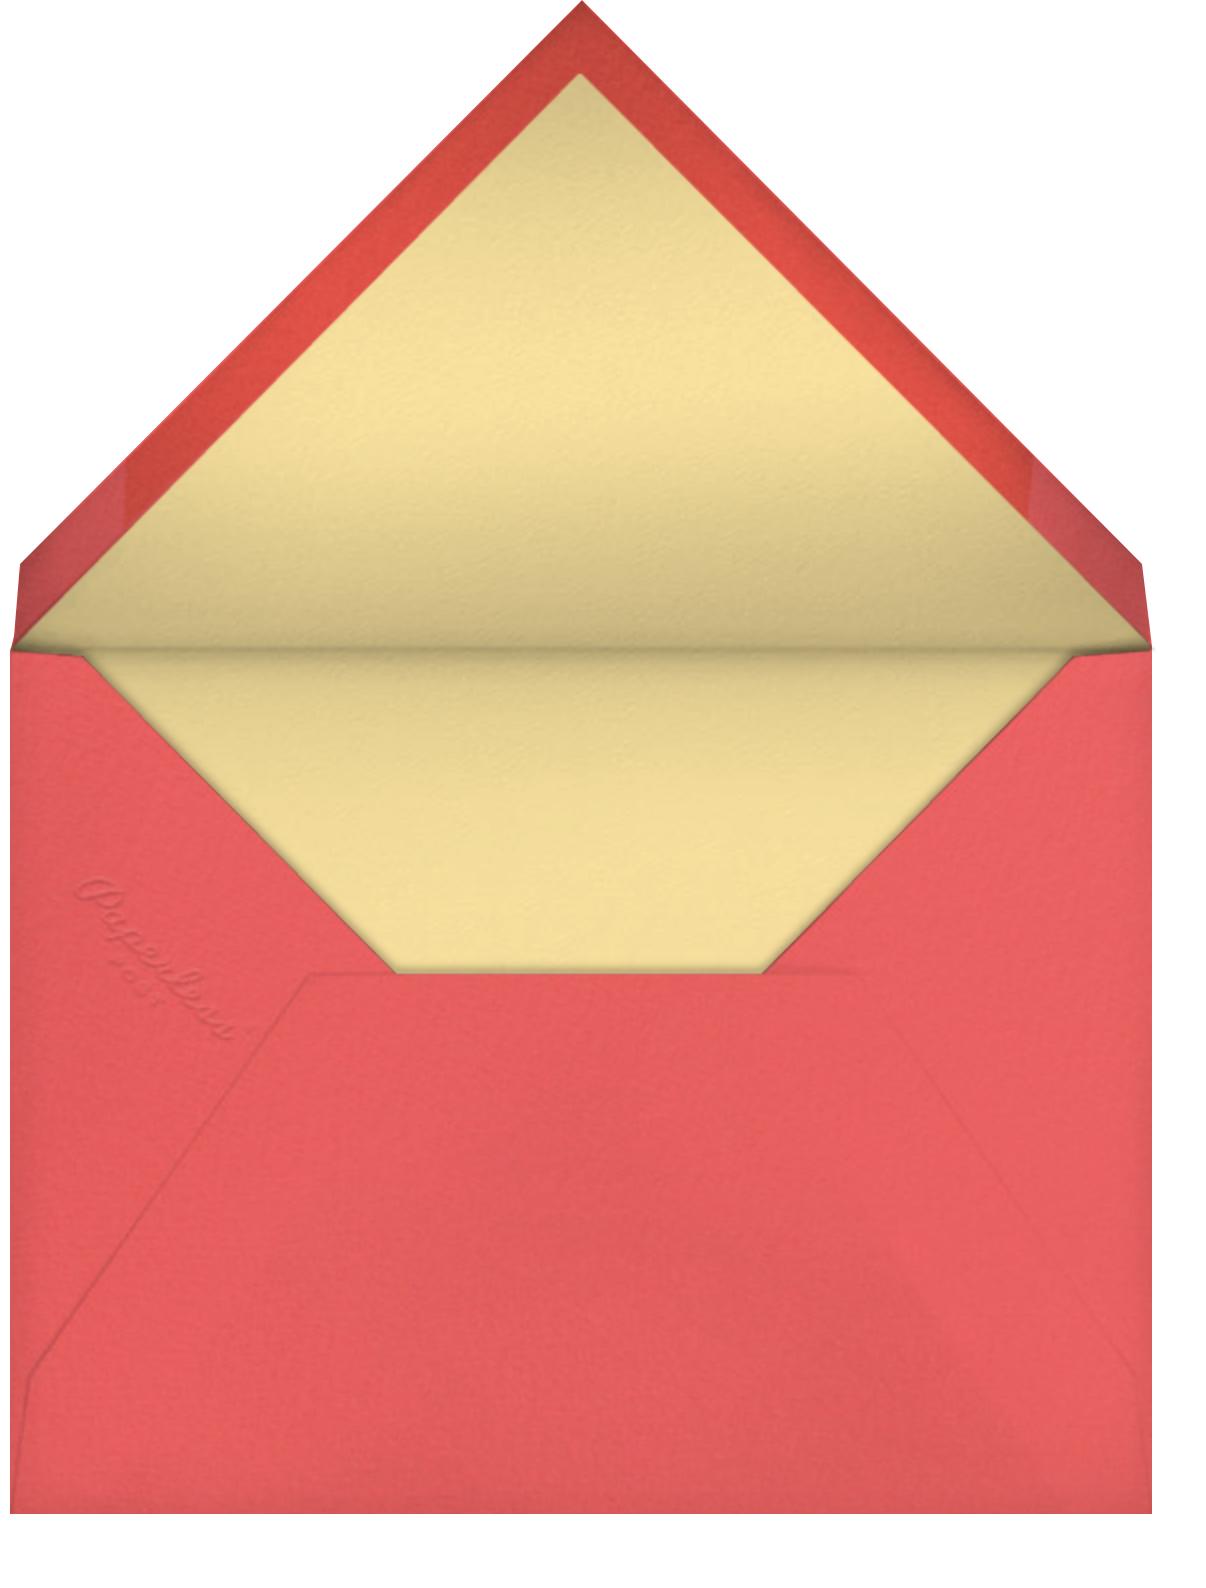 Birthday Bike (Blanca Gómez) - Light - Red Cap Cards - Envelope